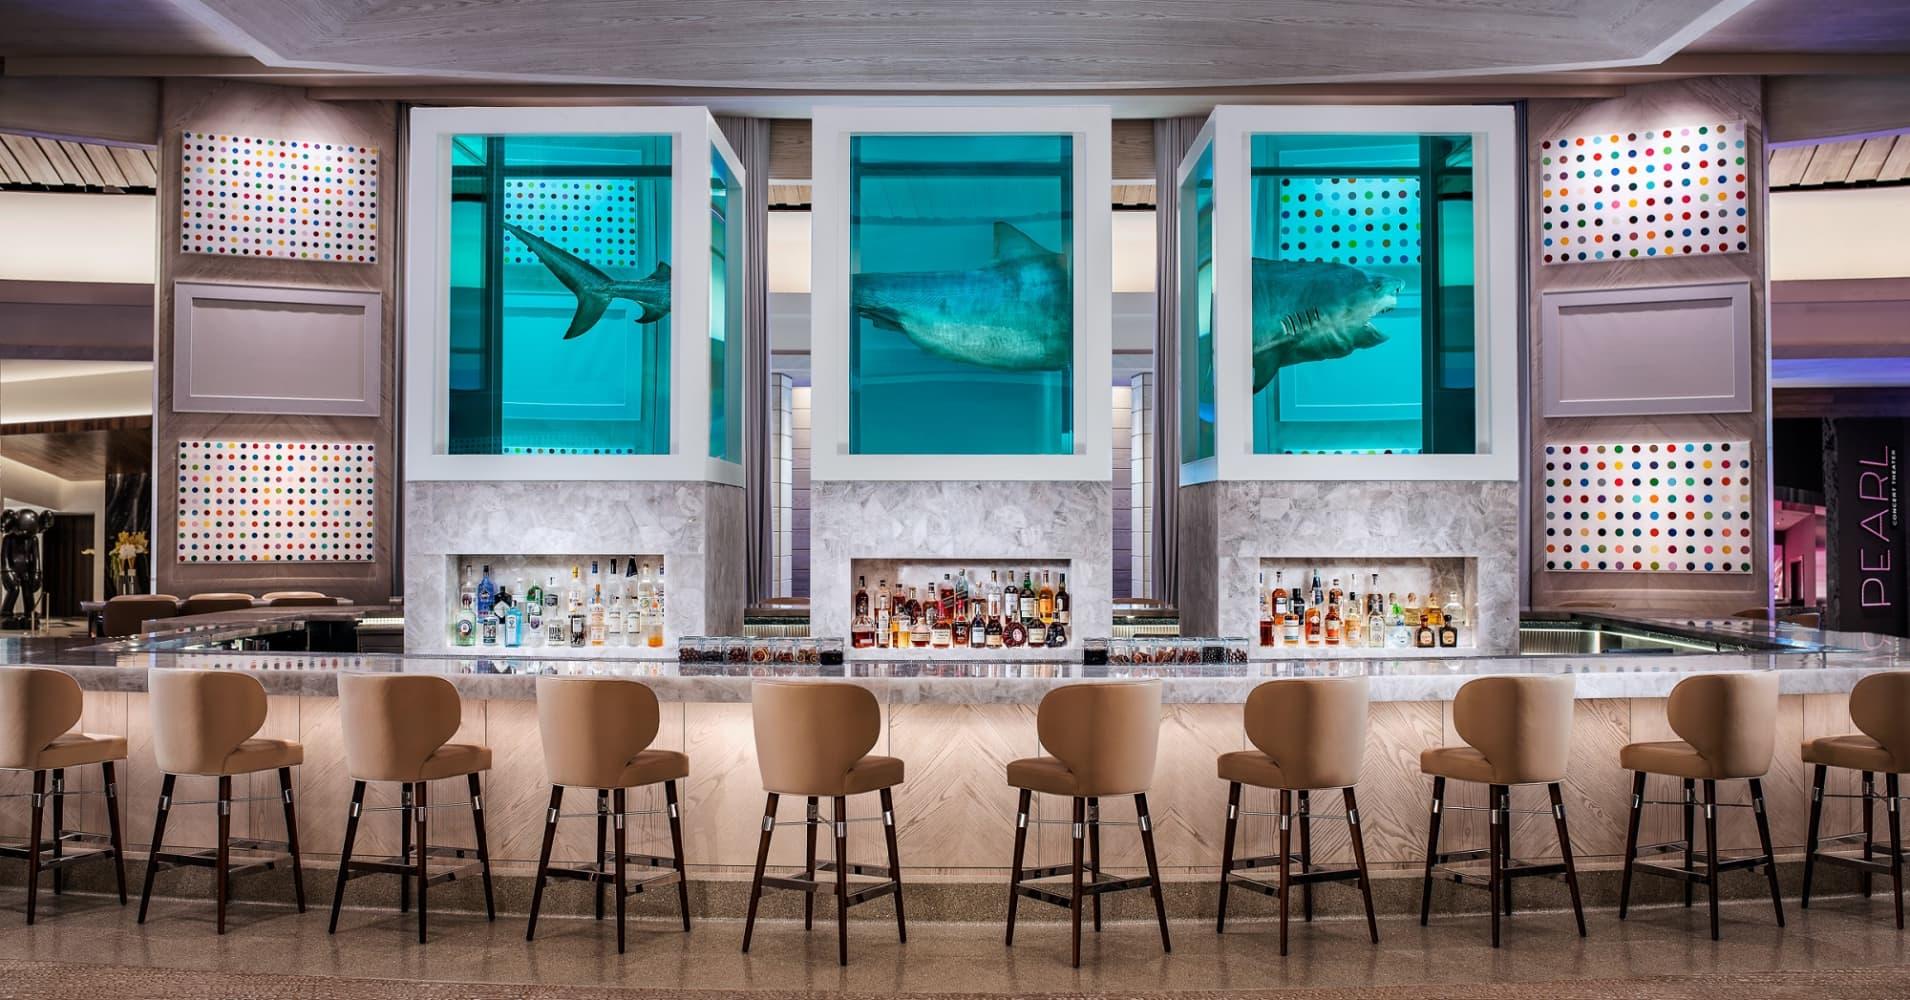 Damien Hirst art at Palms Casino Resort